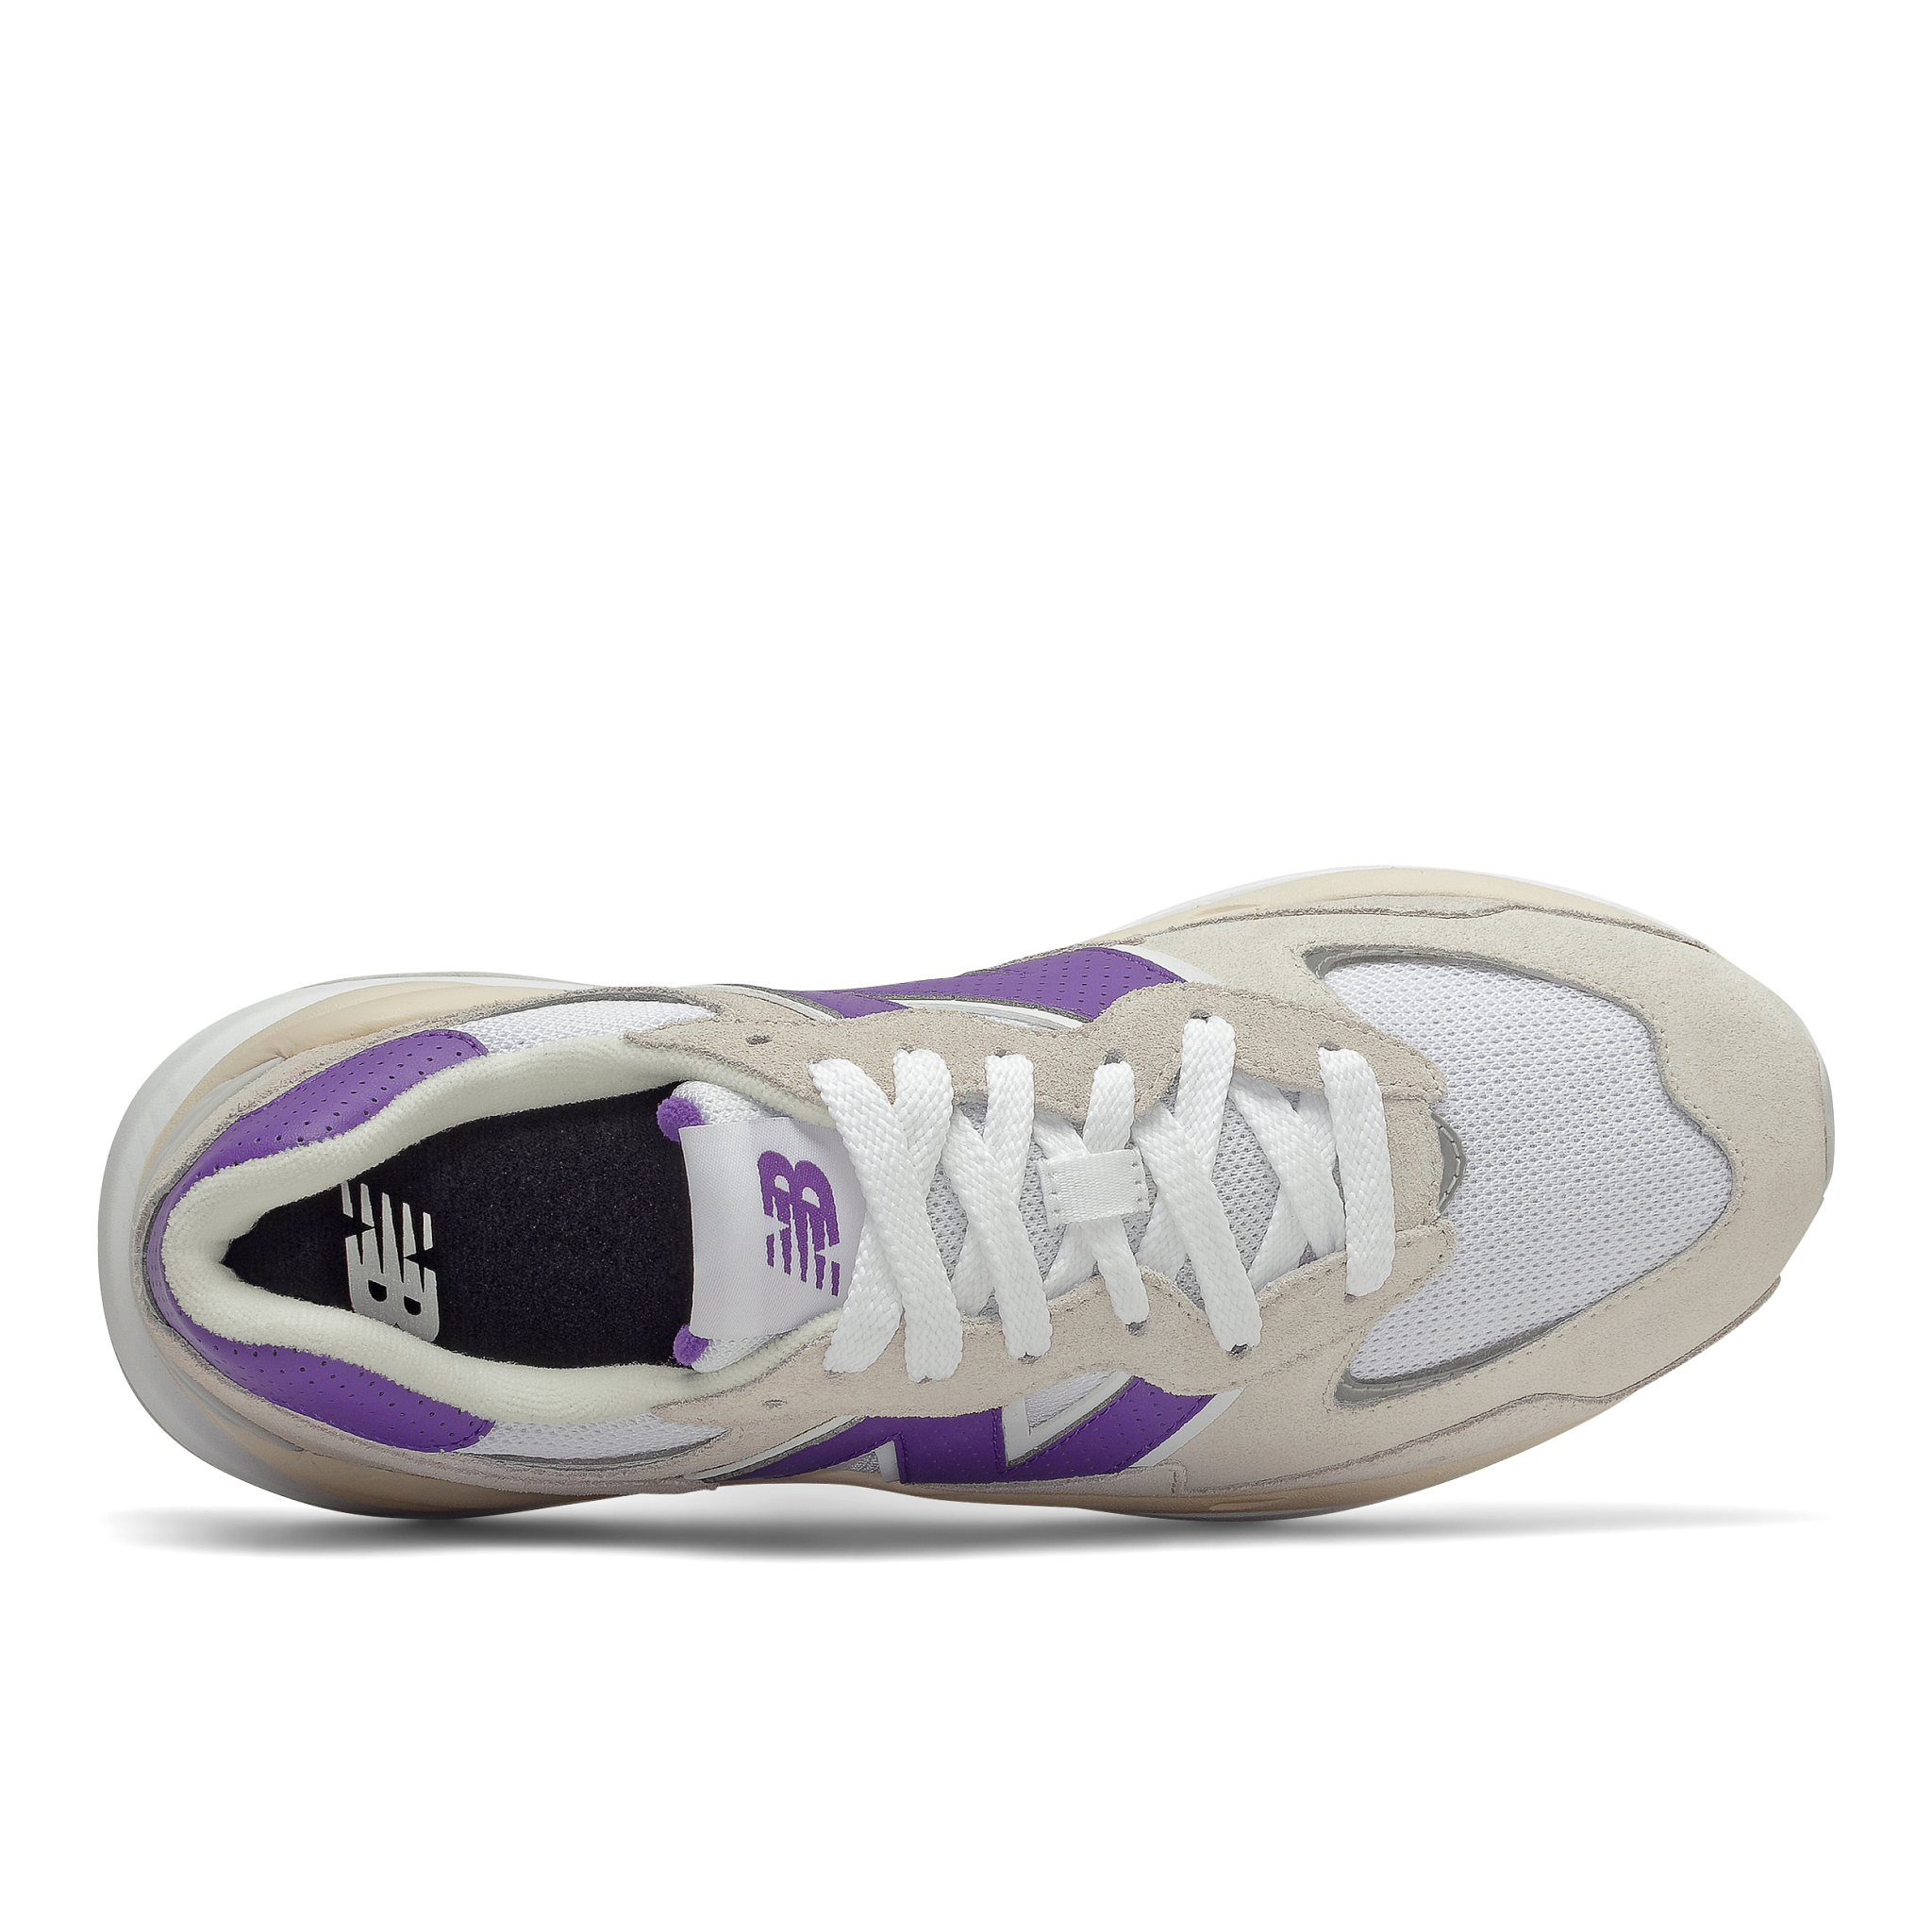 New Balance M5740SB1 Sneakers, Sea Salt, 44.5